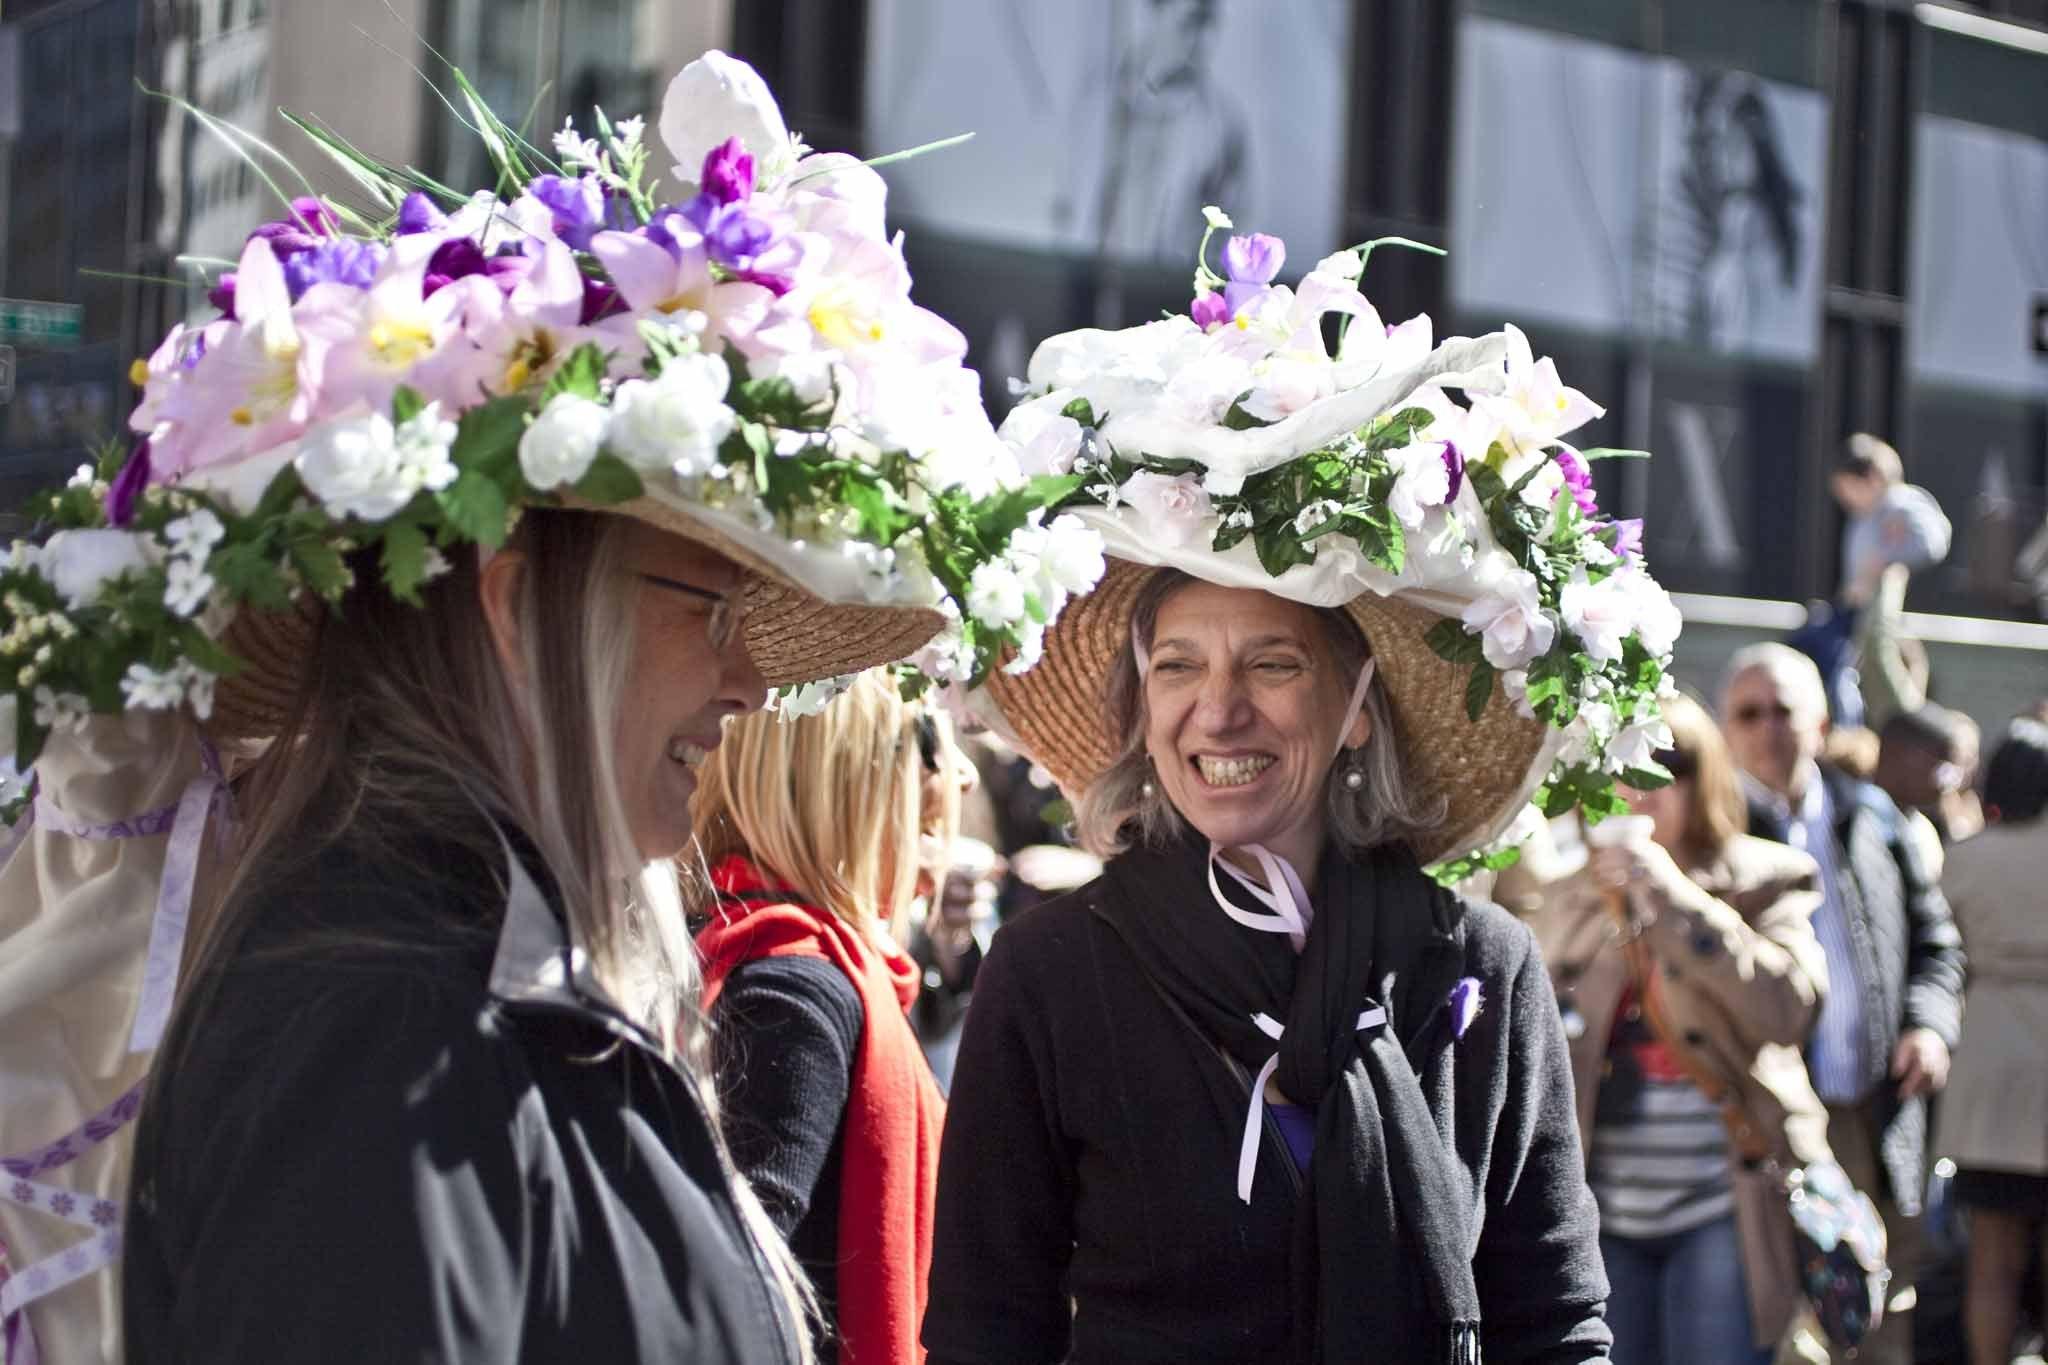 Easter Parade and Bonnet Festival 2012